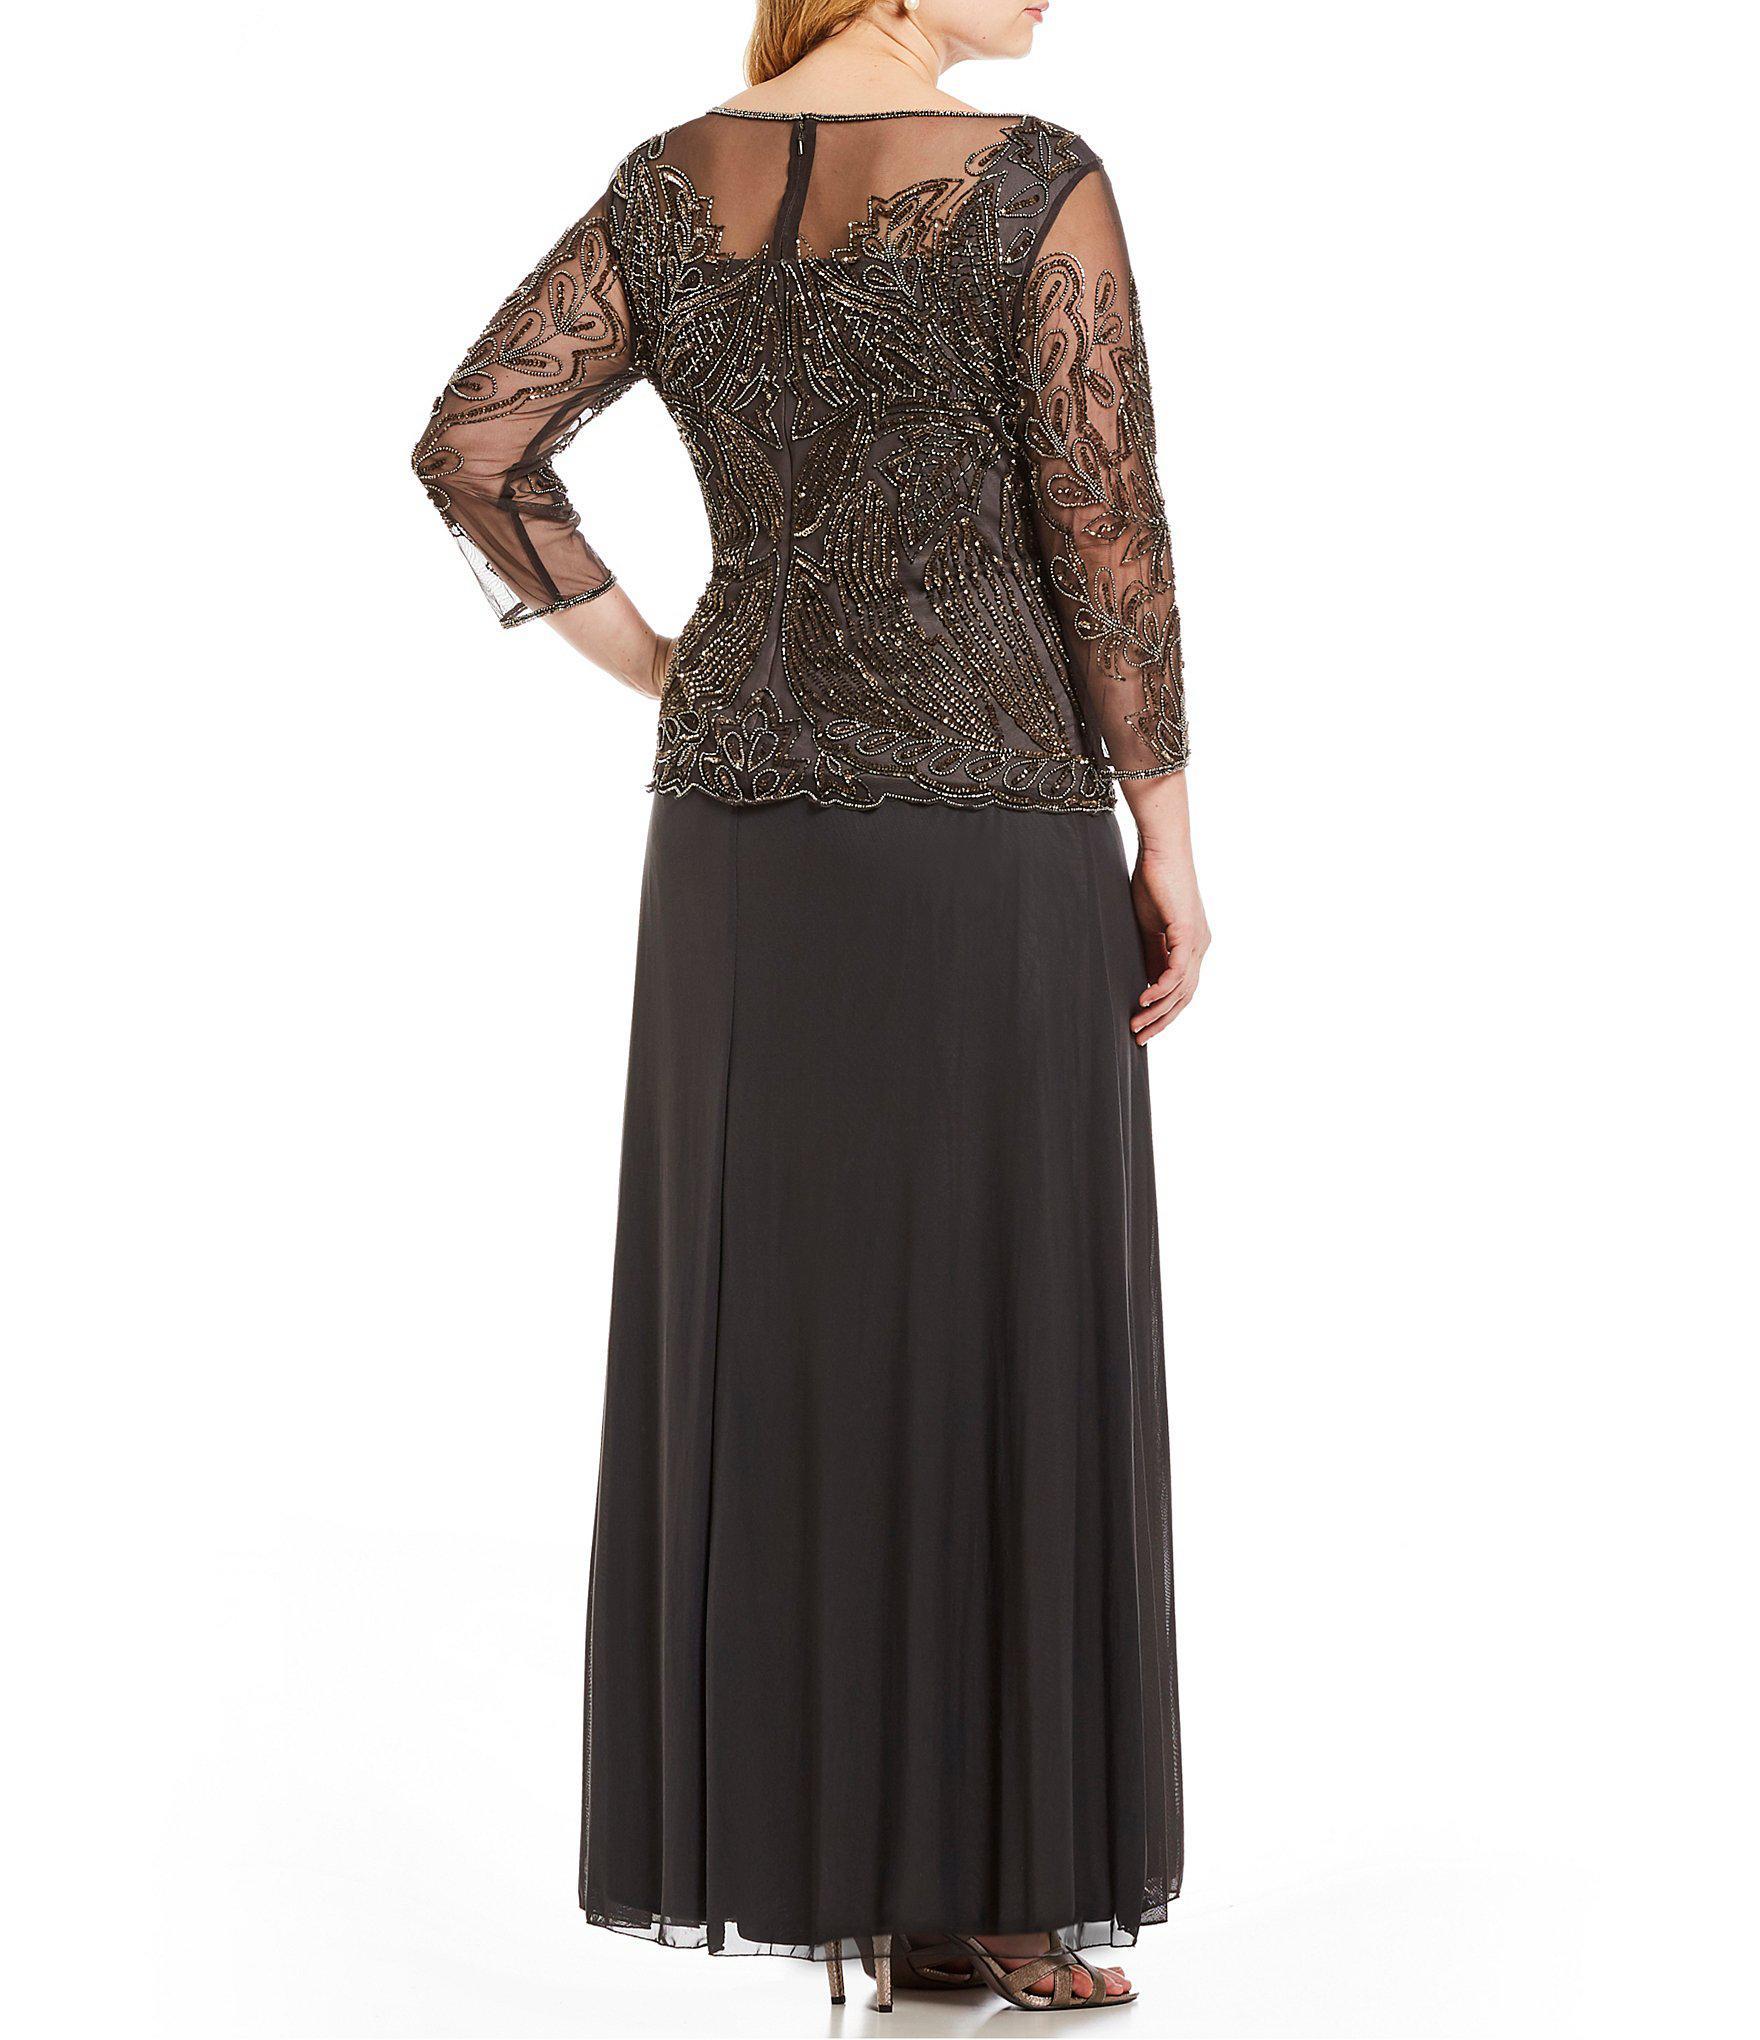 dd50b366123 Lyst - Pisarro Nights Plus Floral Beaded Bodice Mock 2-piece Dress ...